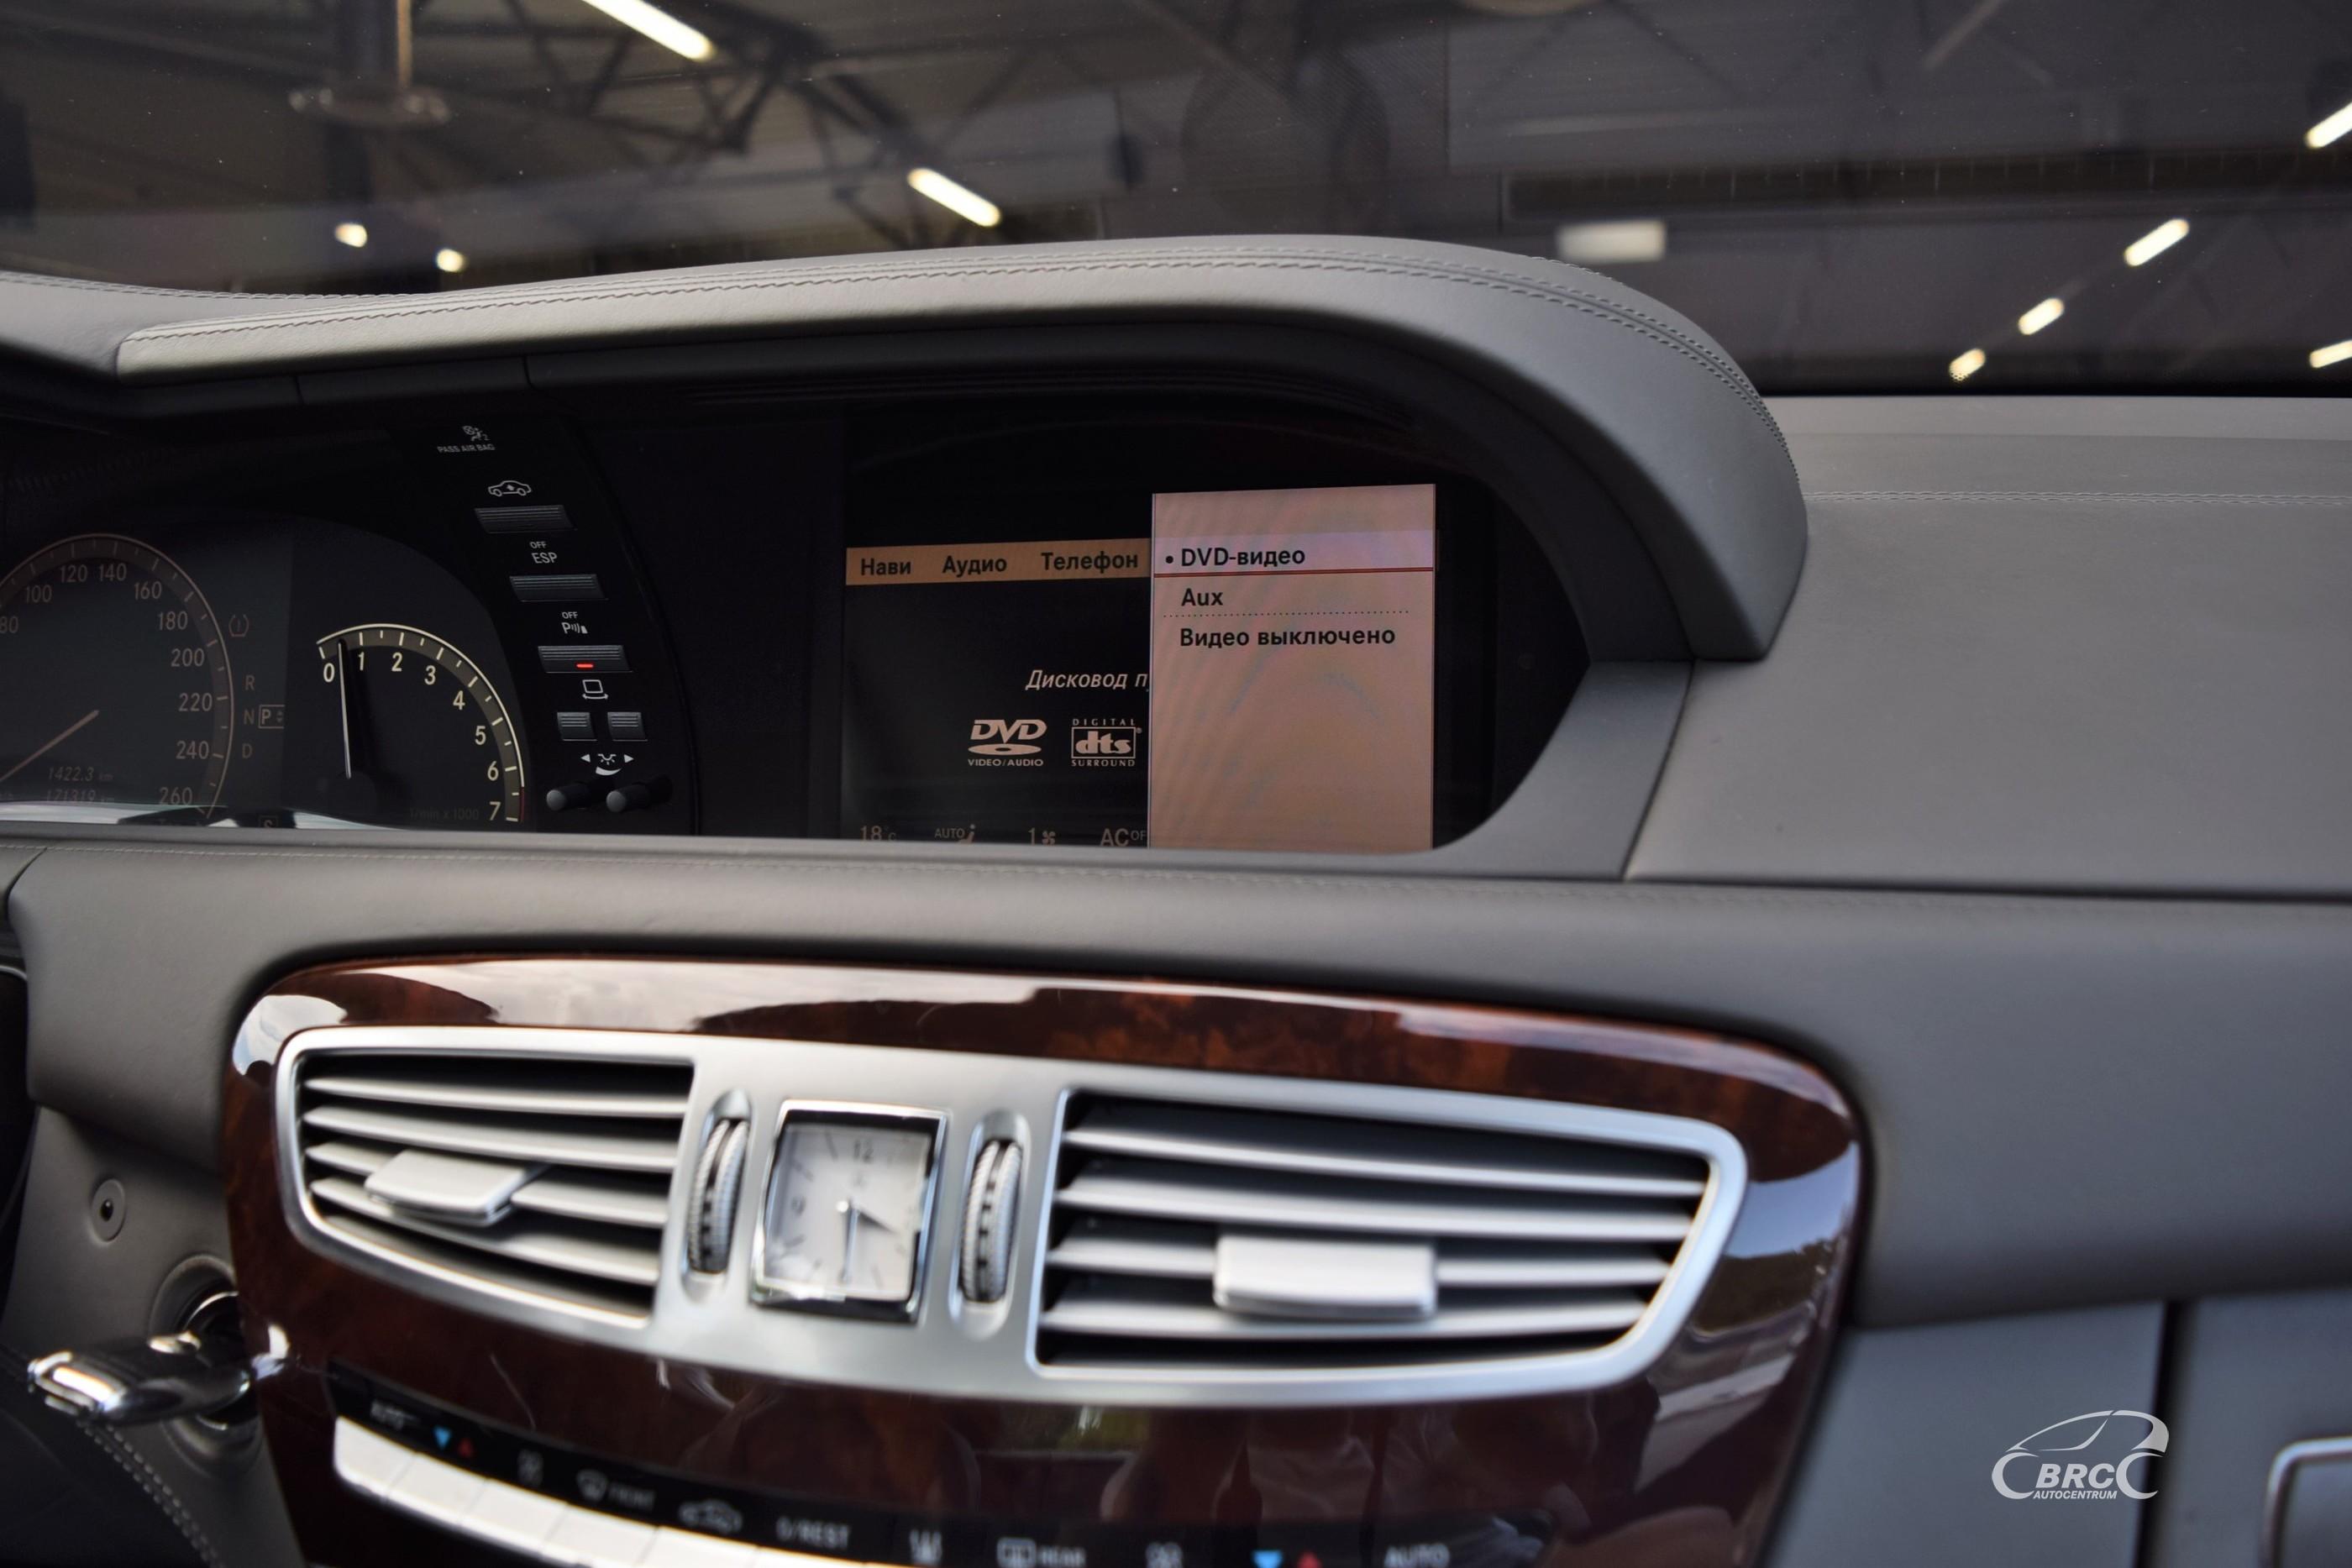 Mercedes-Benz CL 500 AMG Design